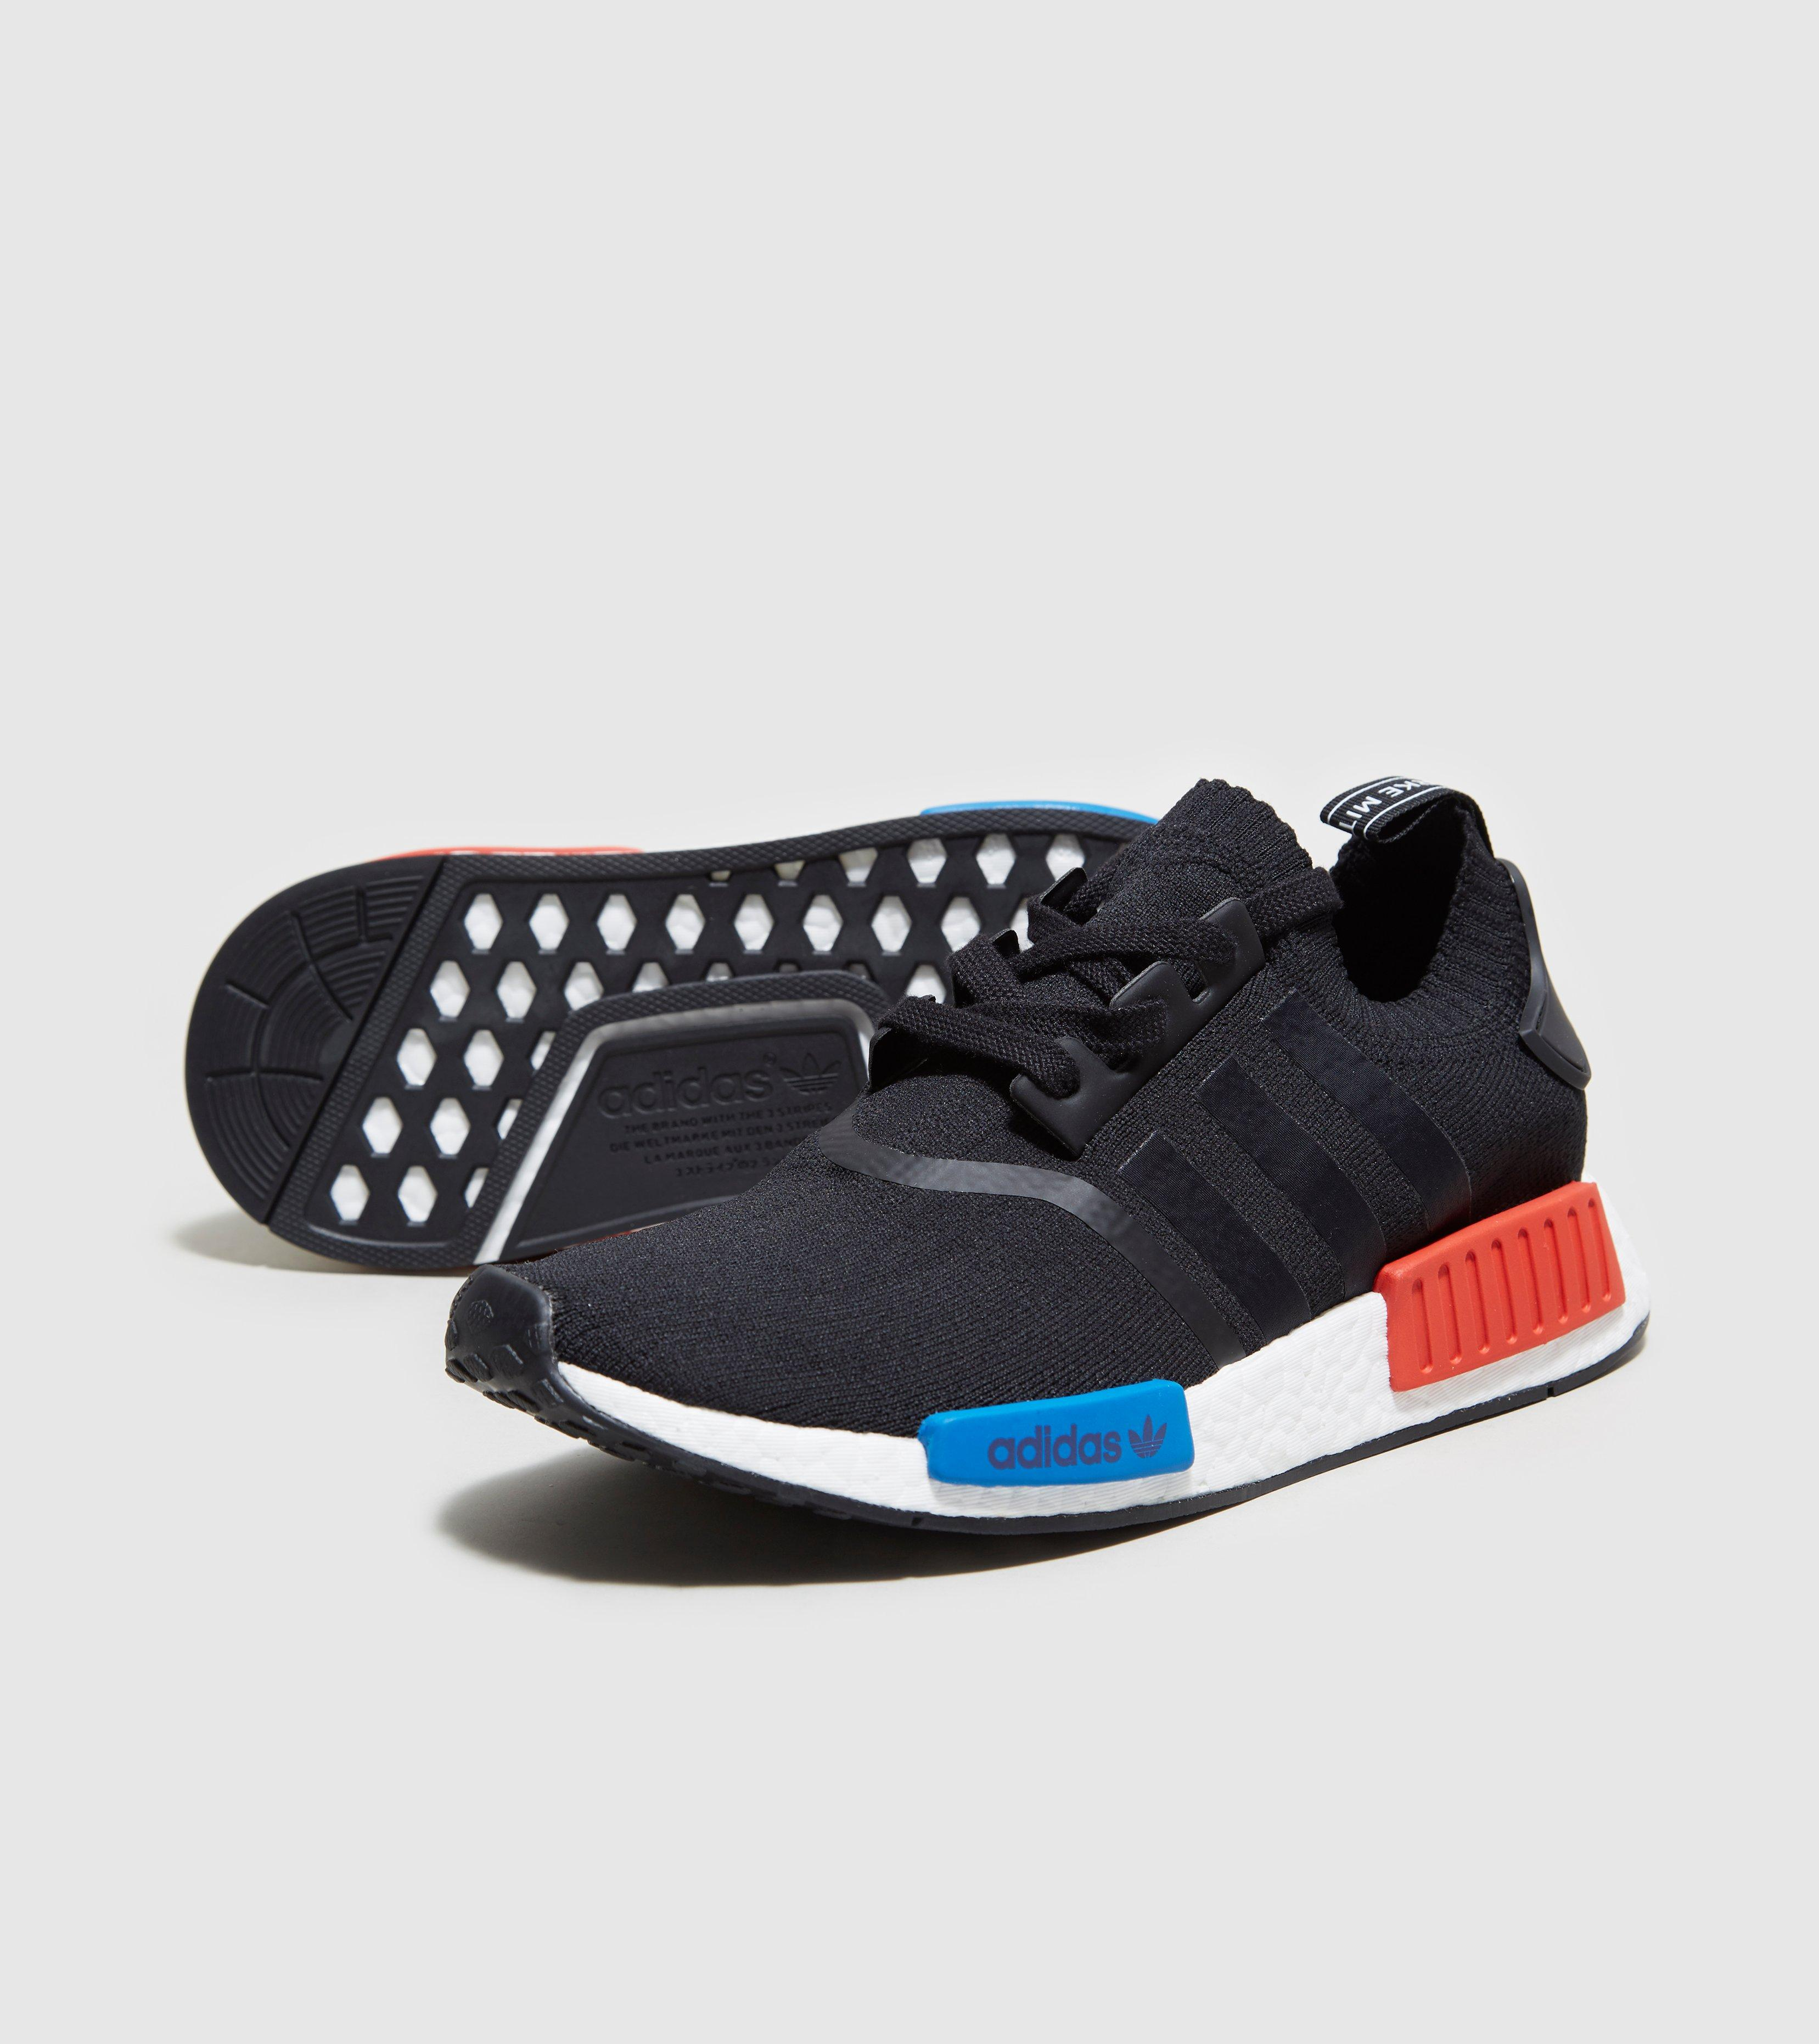 adidas nmd xr1 black 2017 adidas stan smith primeknit size 8